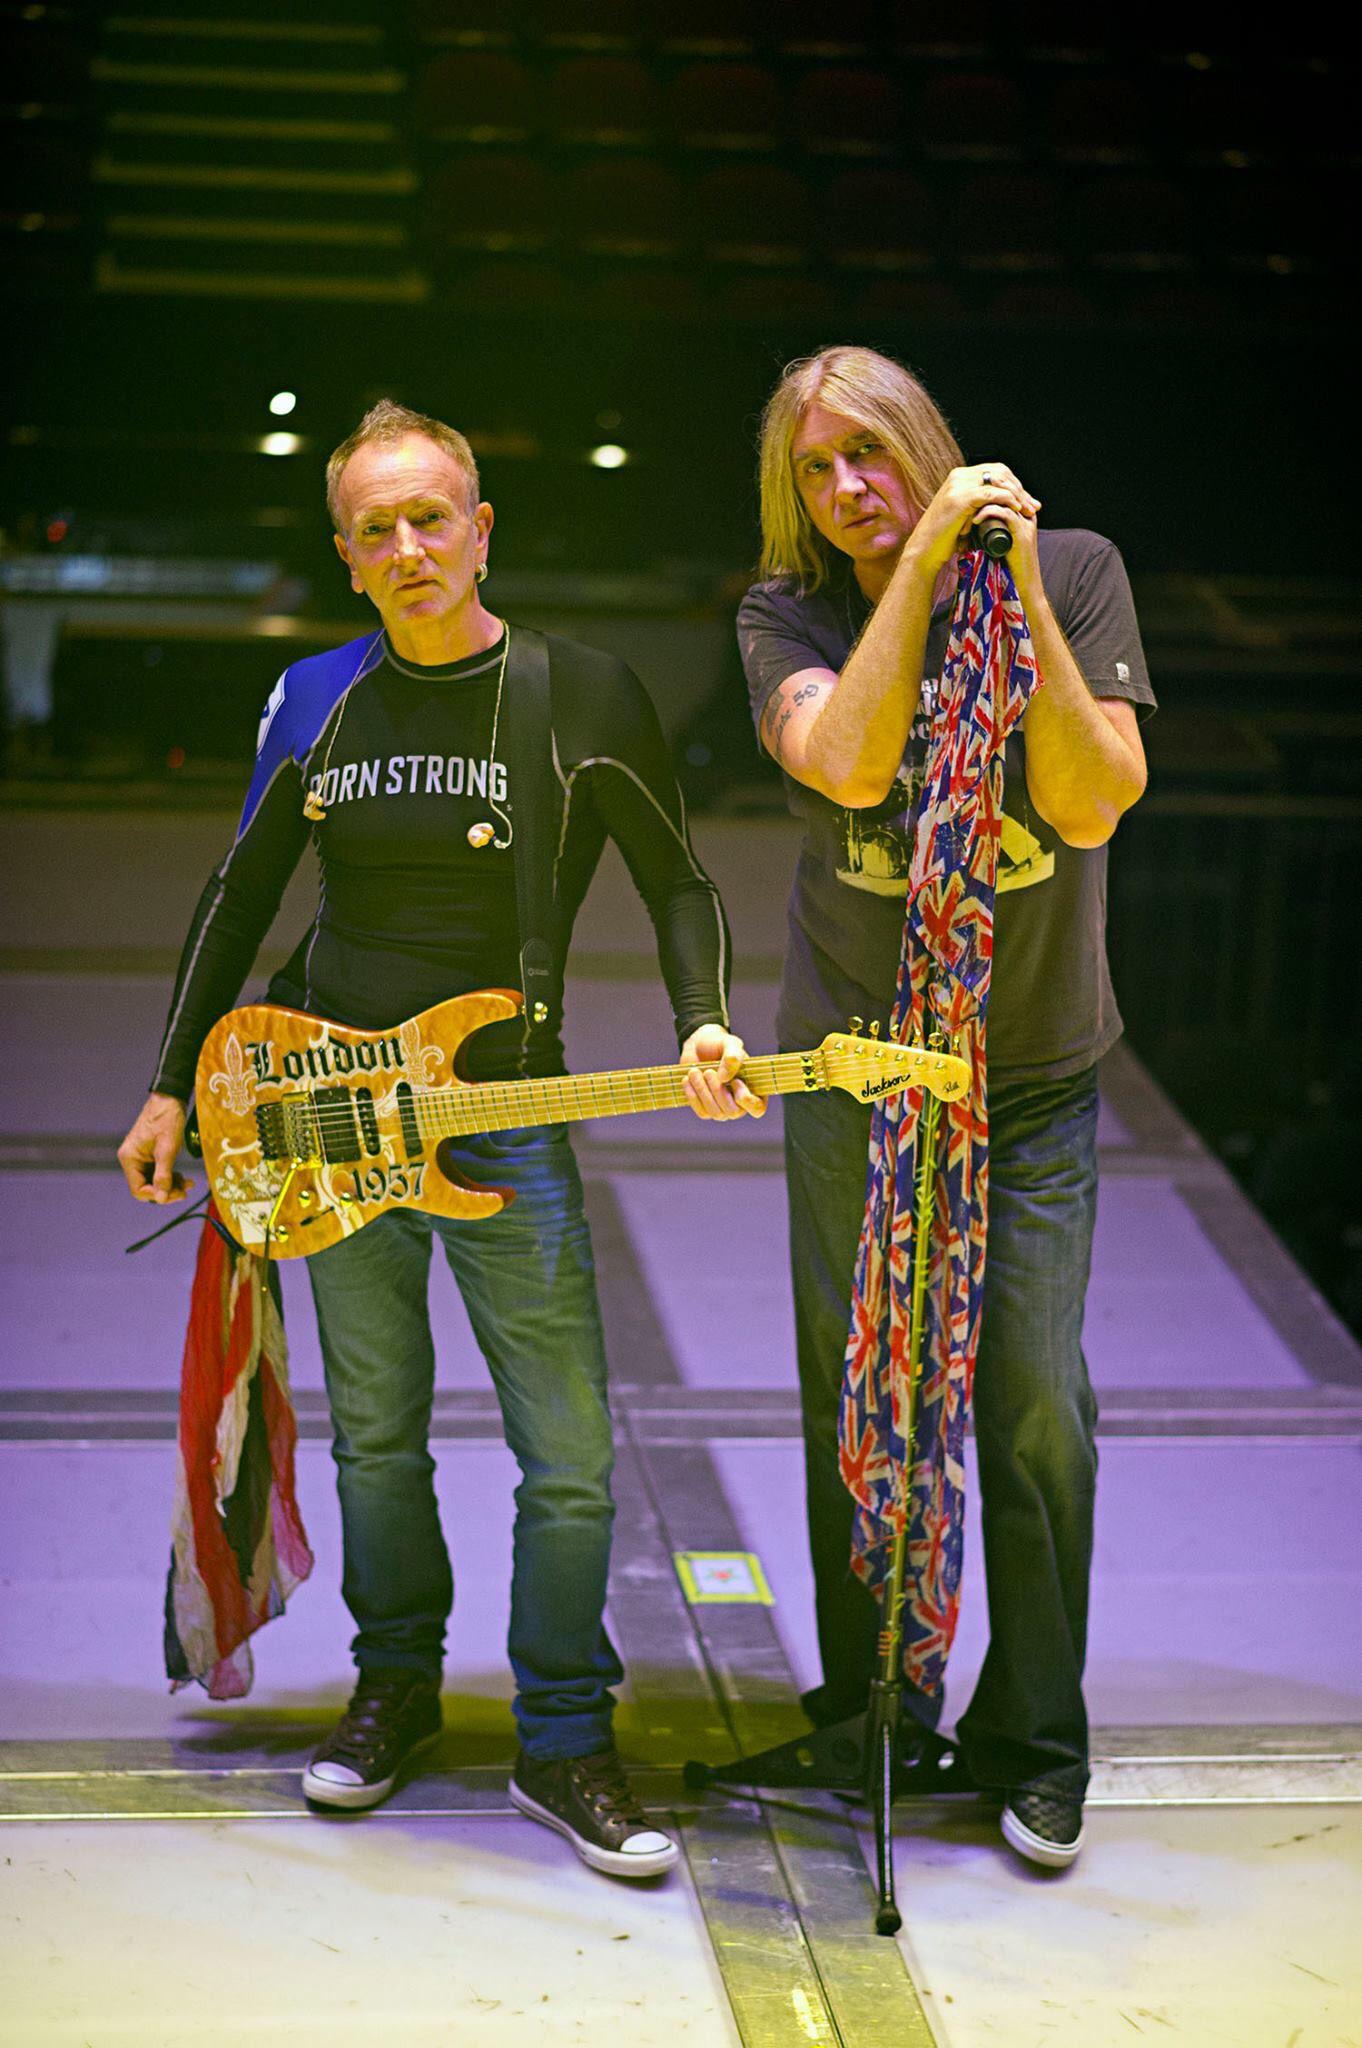 Phill and Joe - Def Leppard